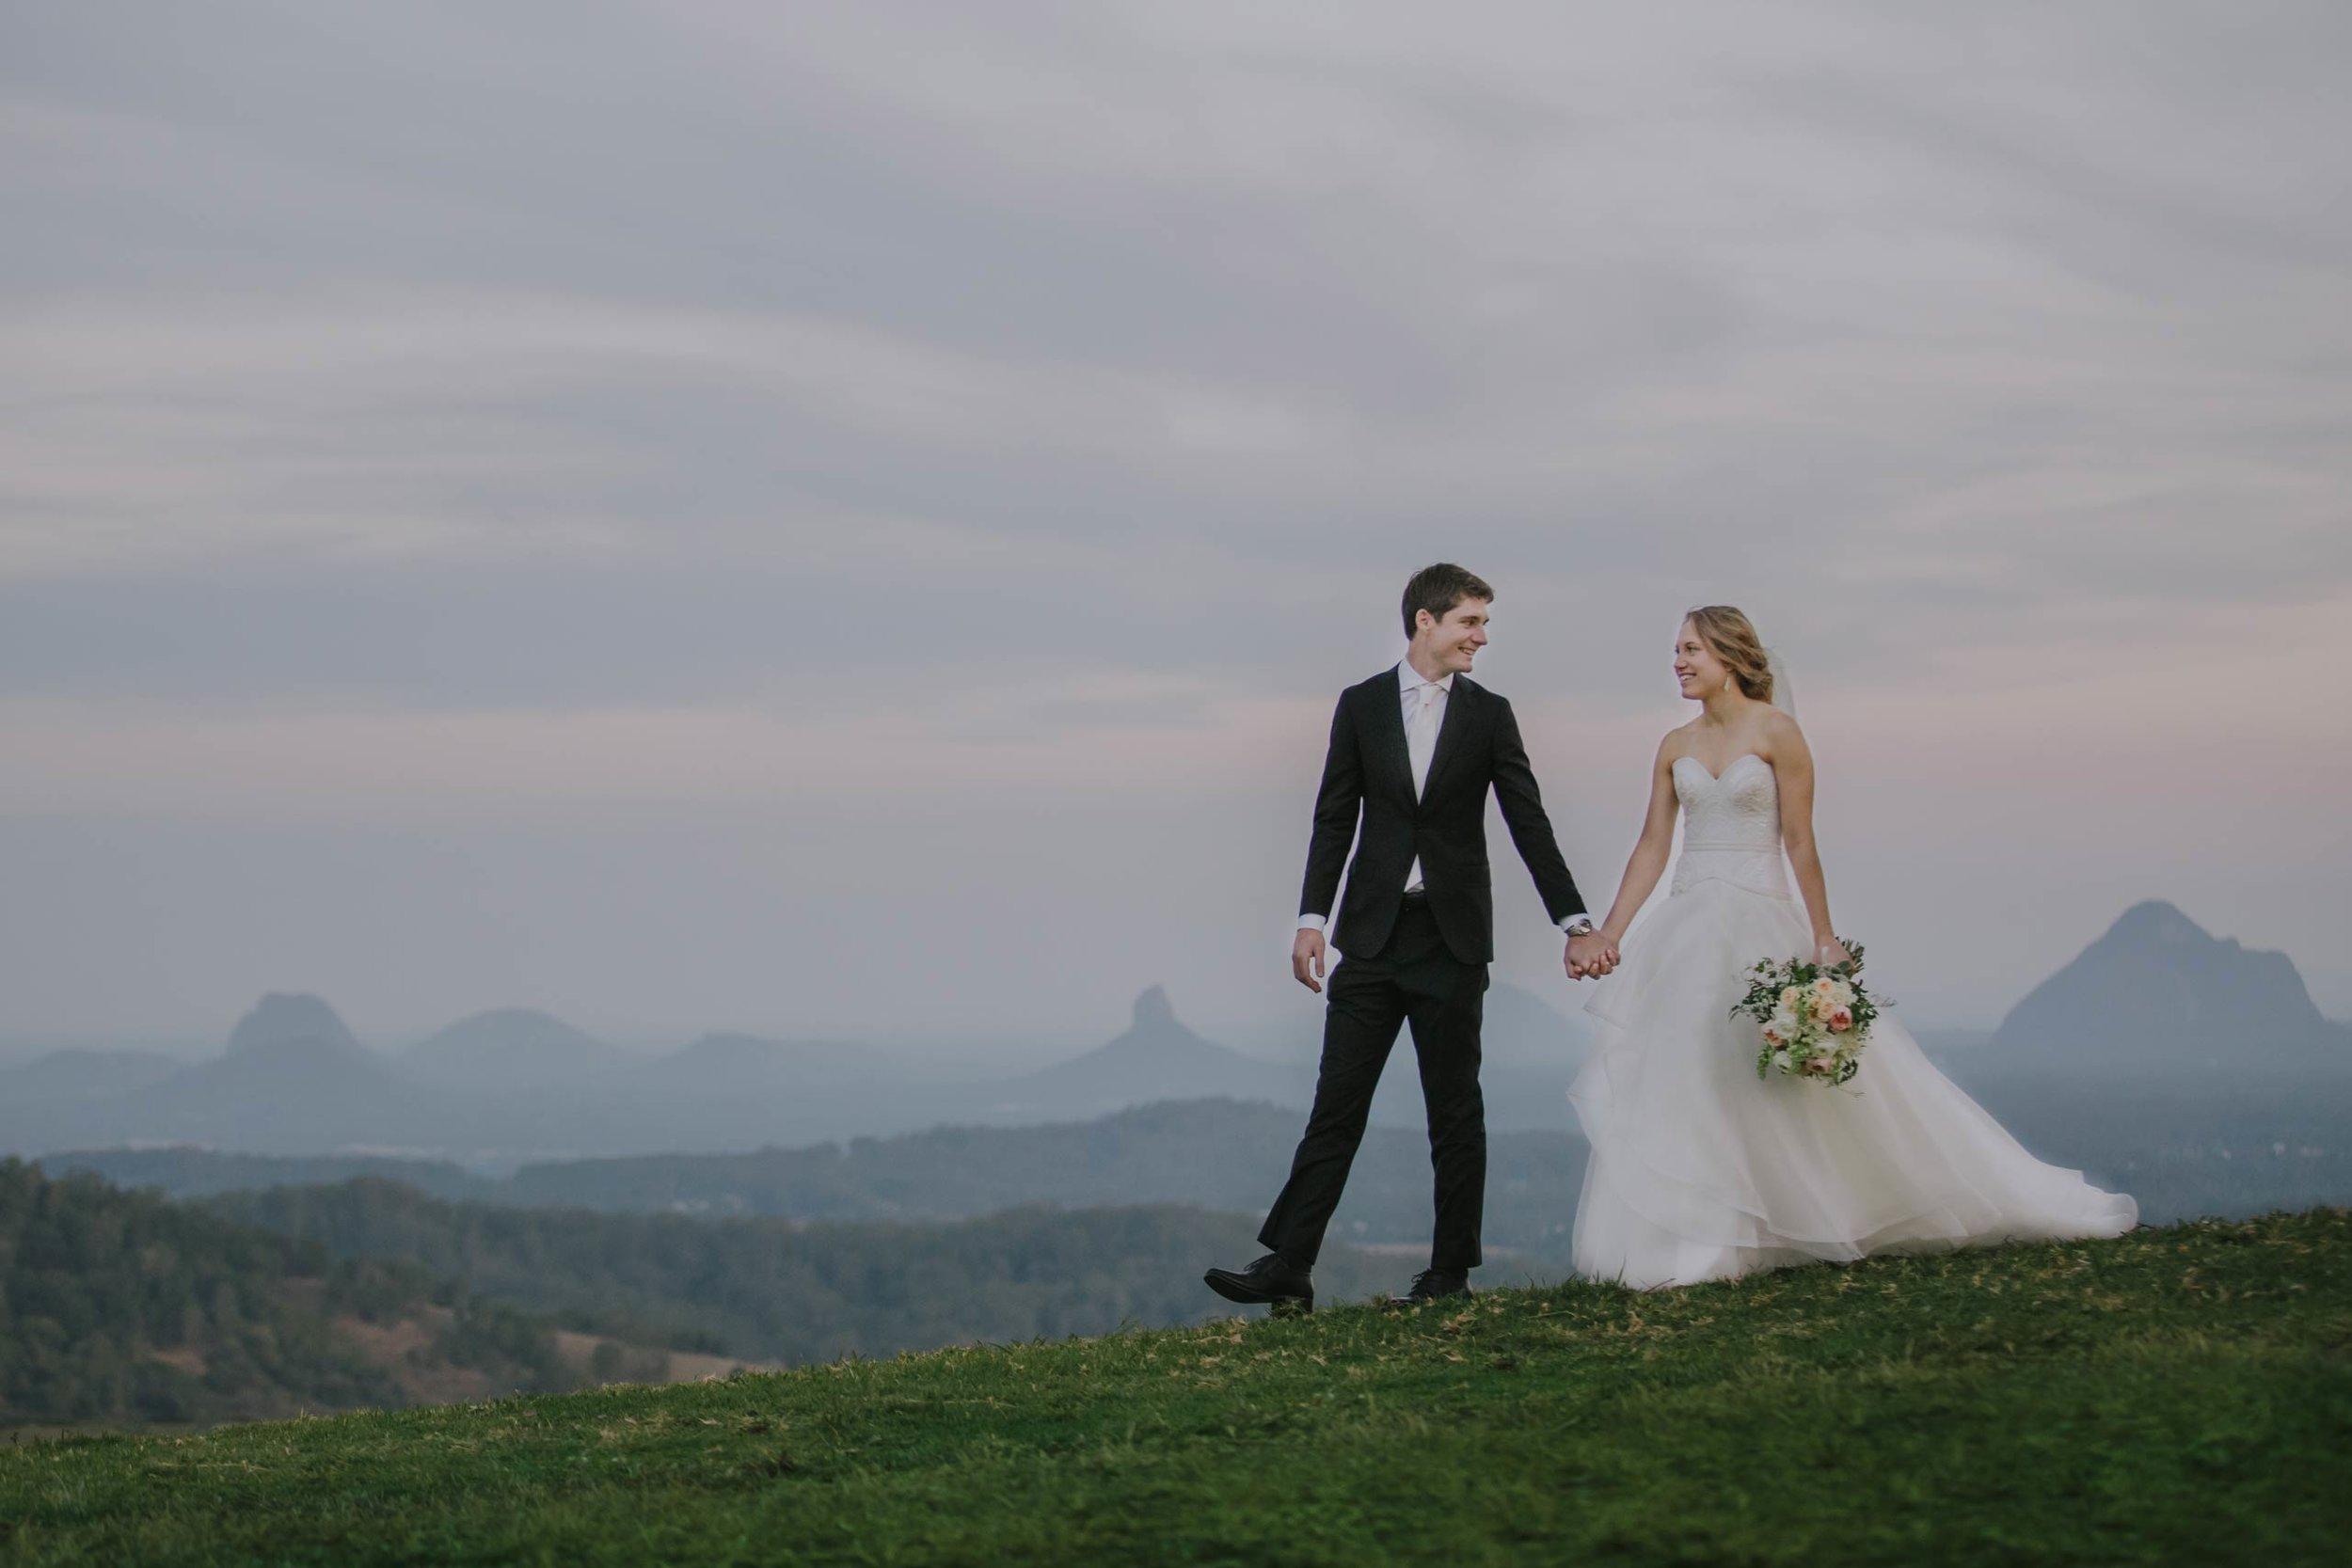 Maleny Retreat Destination Wedding Photographer - Top Sunshine Coast, Queensland, Australian Blog